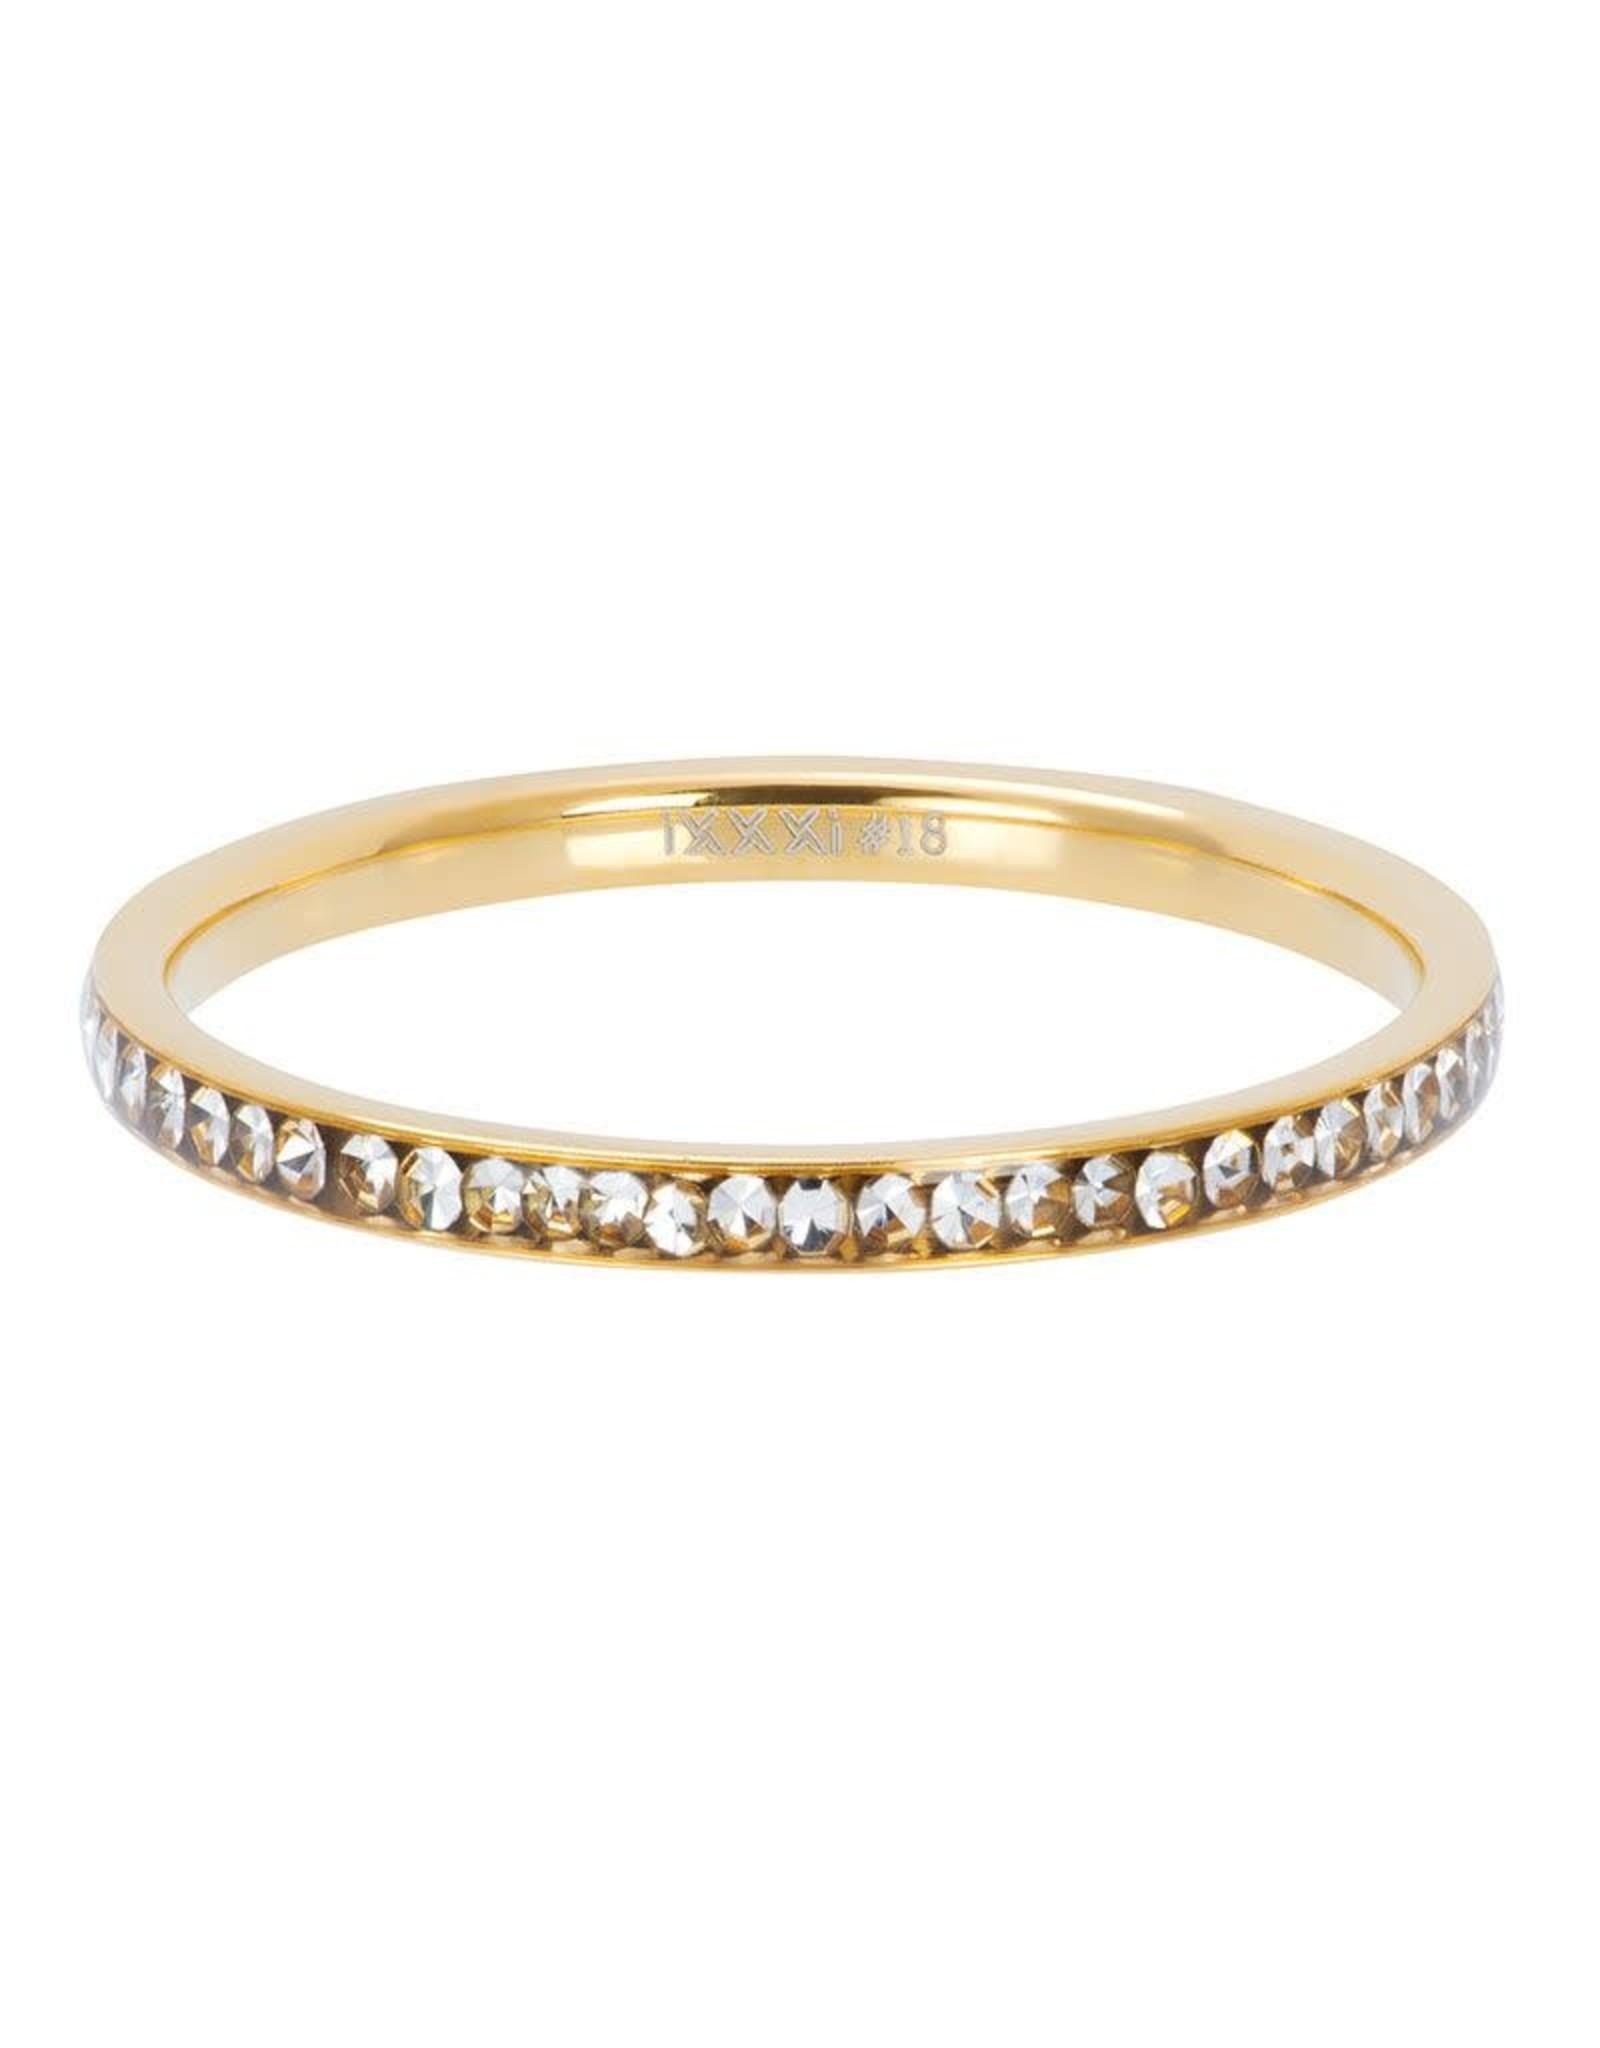 IXXXI IXXXI Zirconia Crystal ring Gold